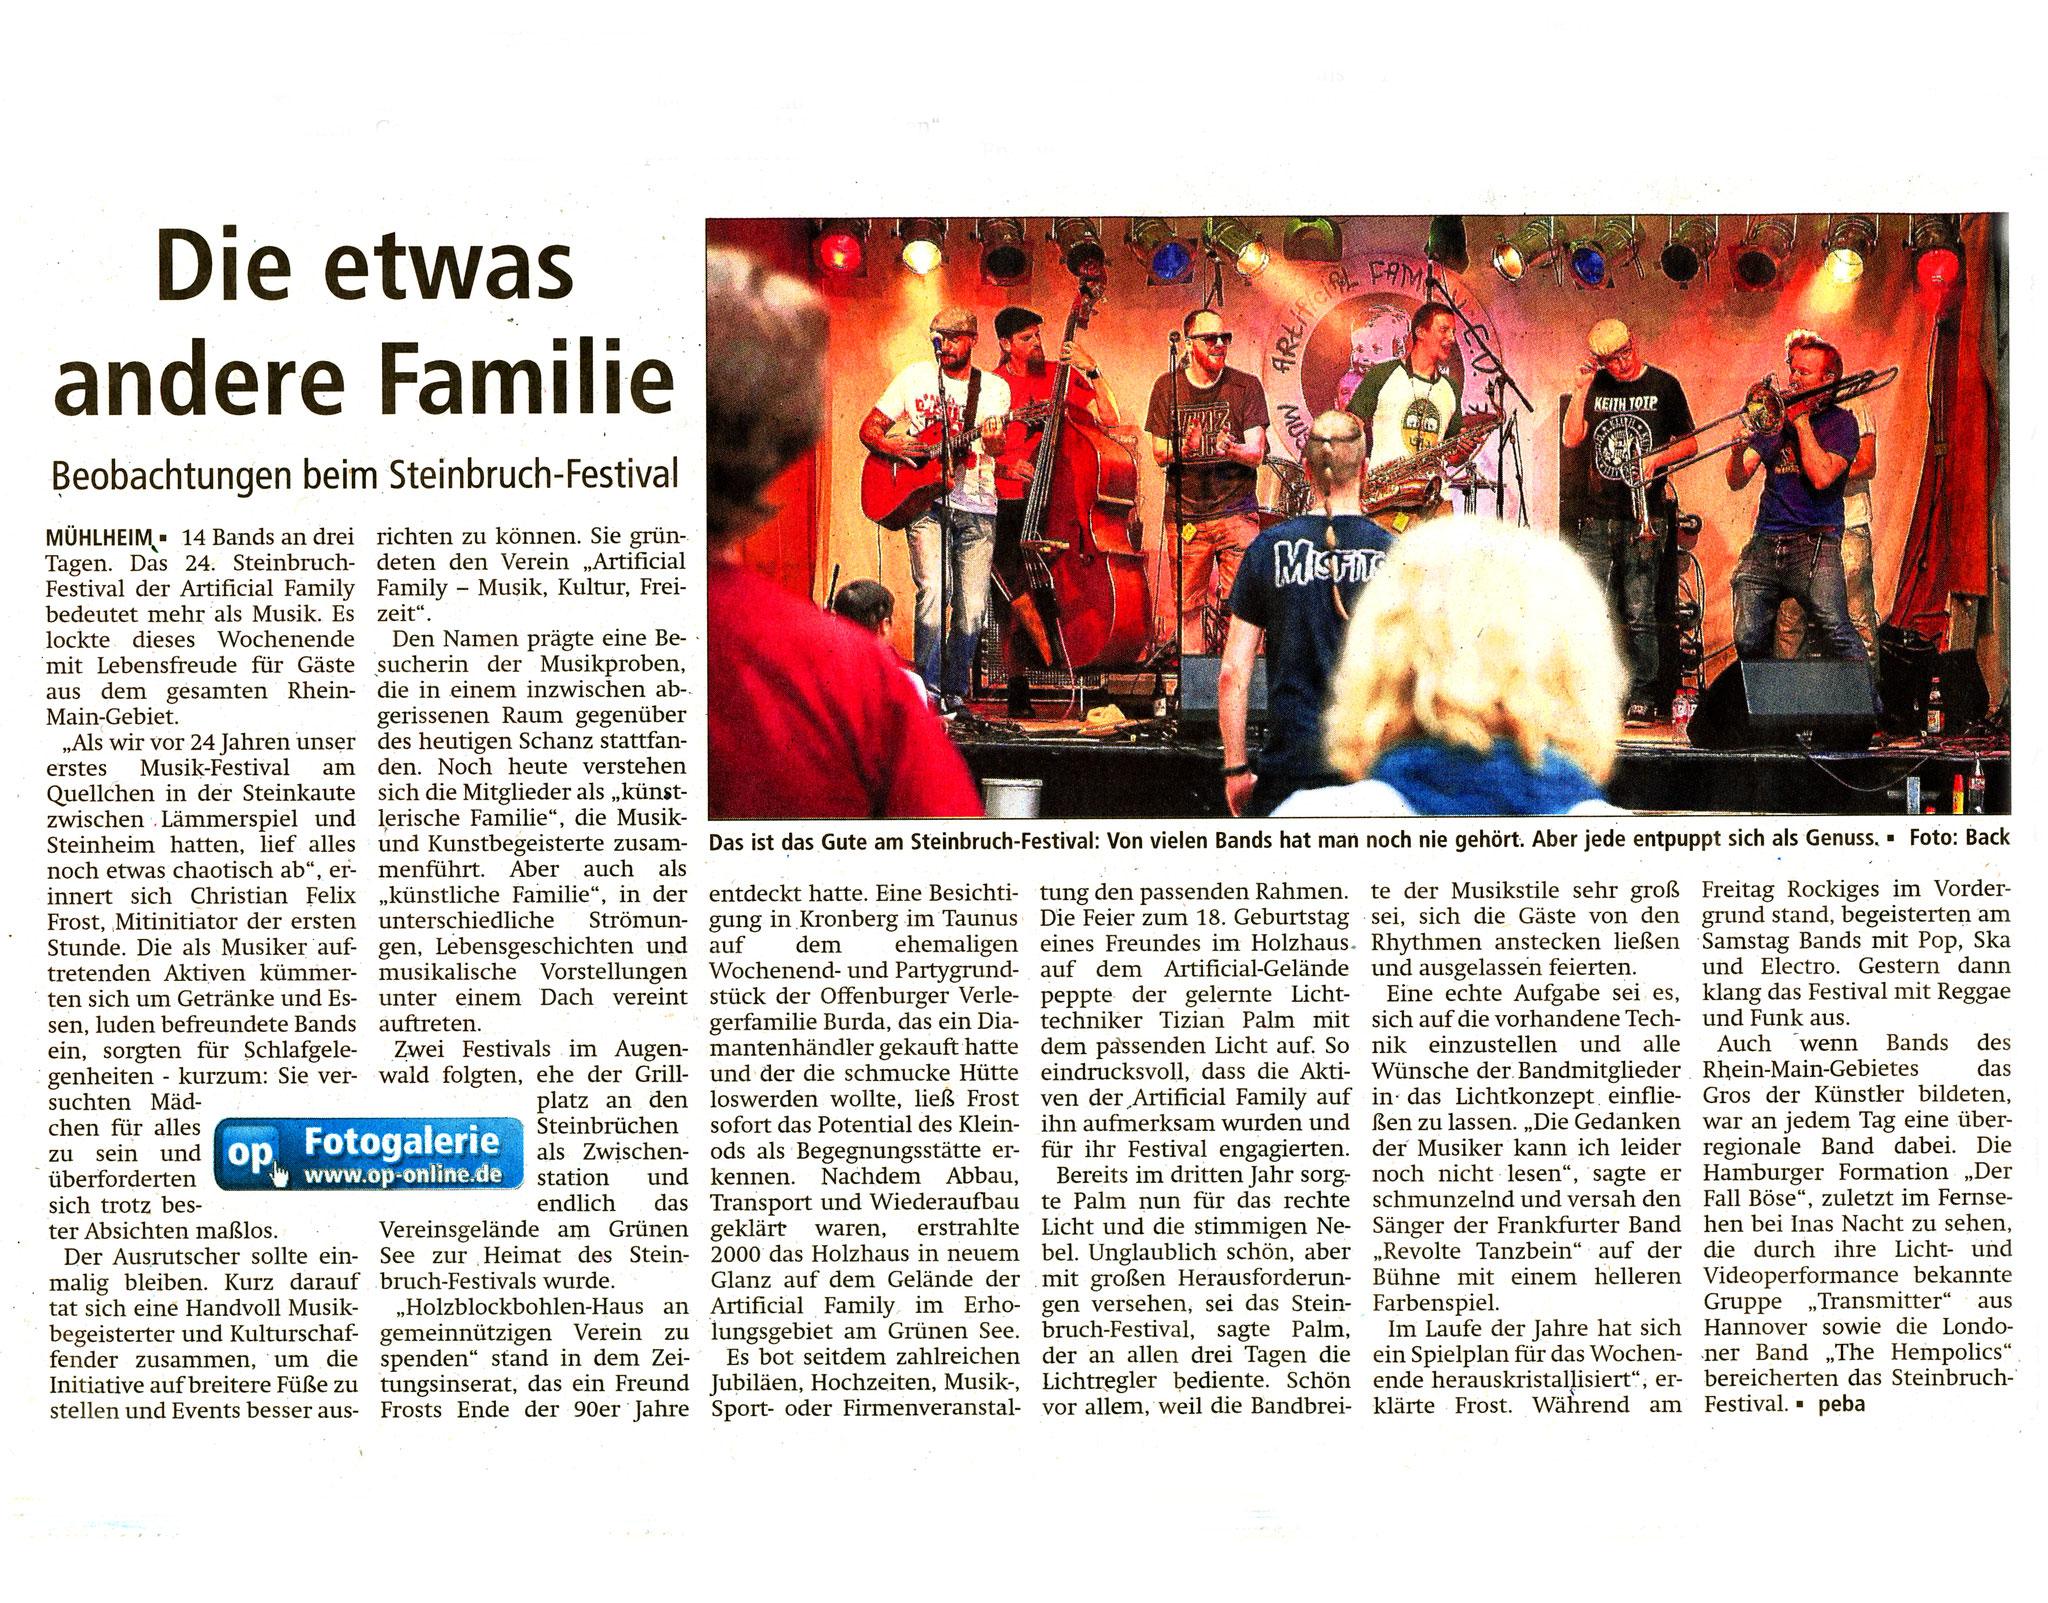 Offenbach Post, 18. Juli 2016